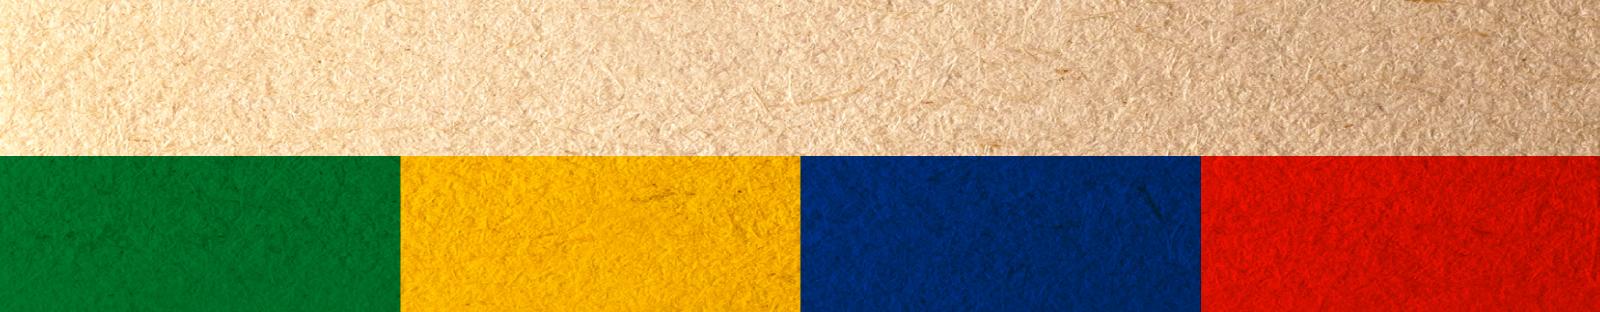 Colour palette.     Click to enlarge.